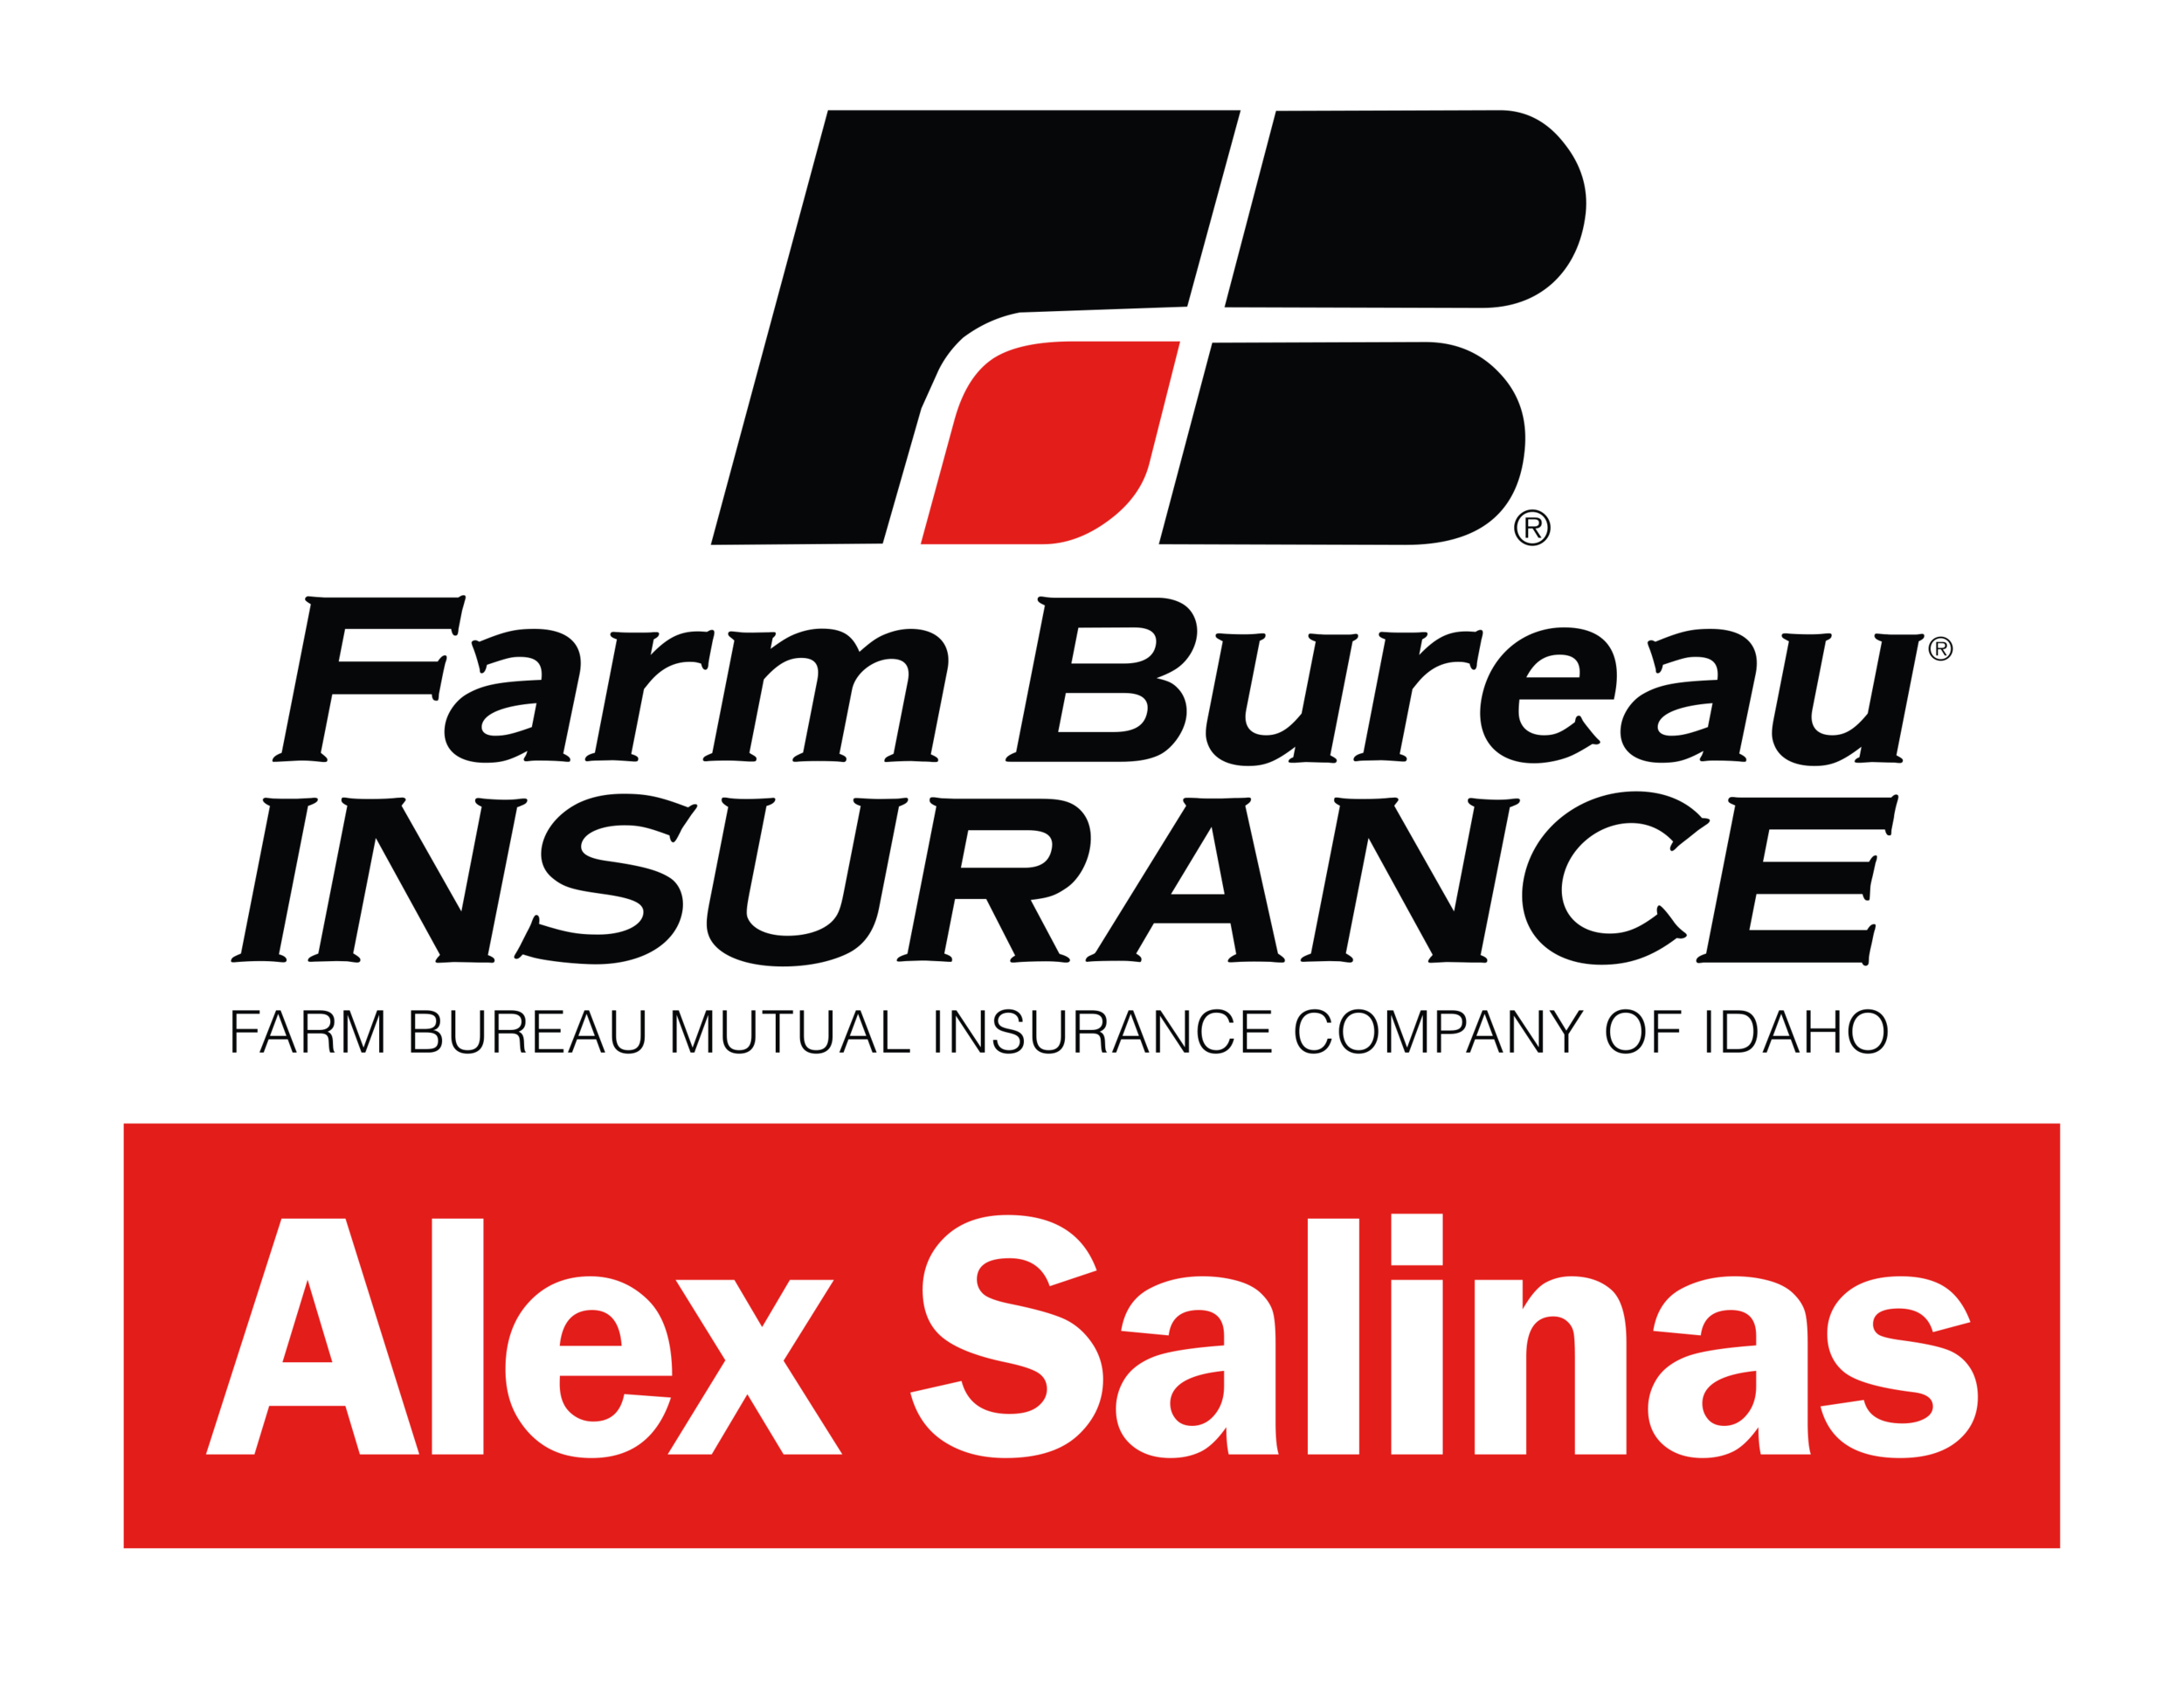 Alex Salinas Golf Sign copy.png